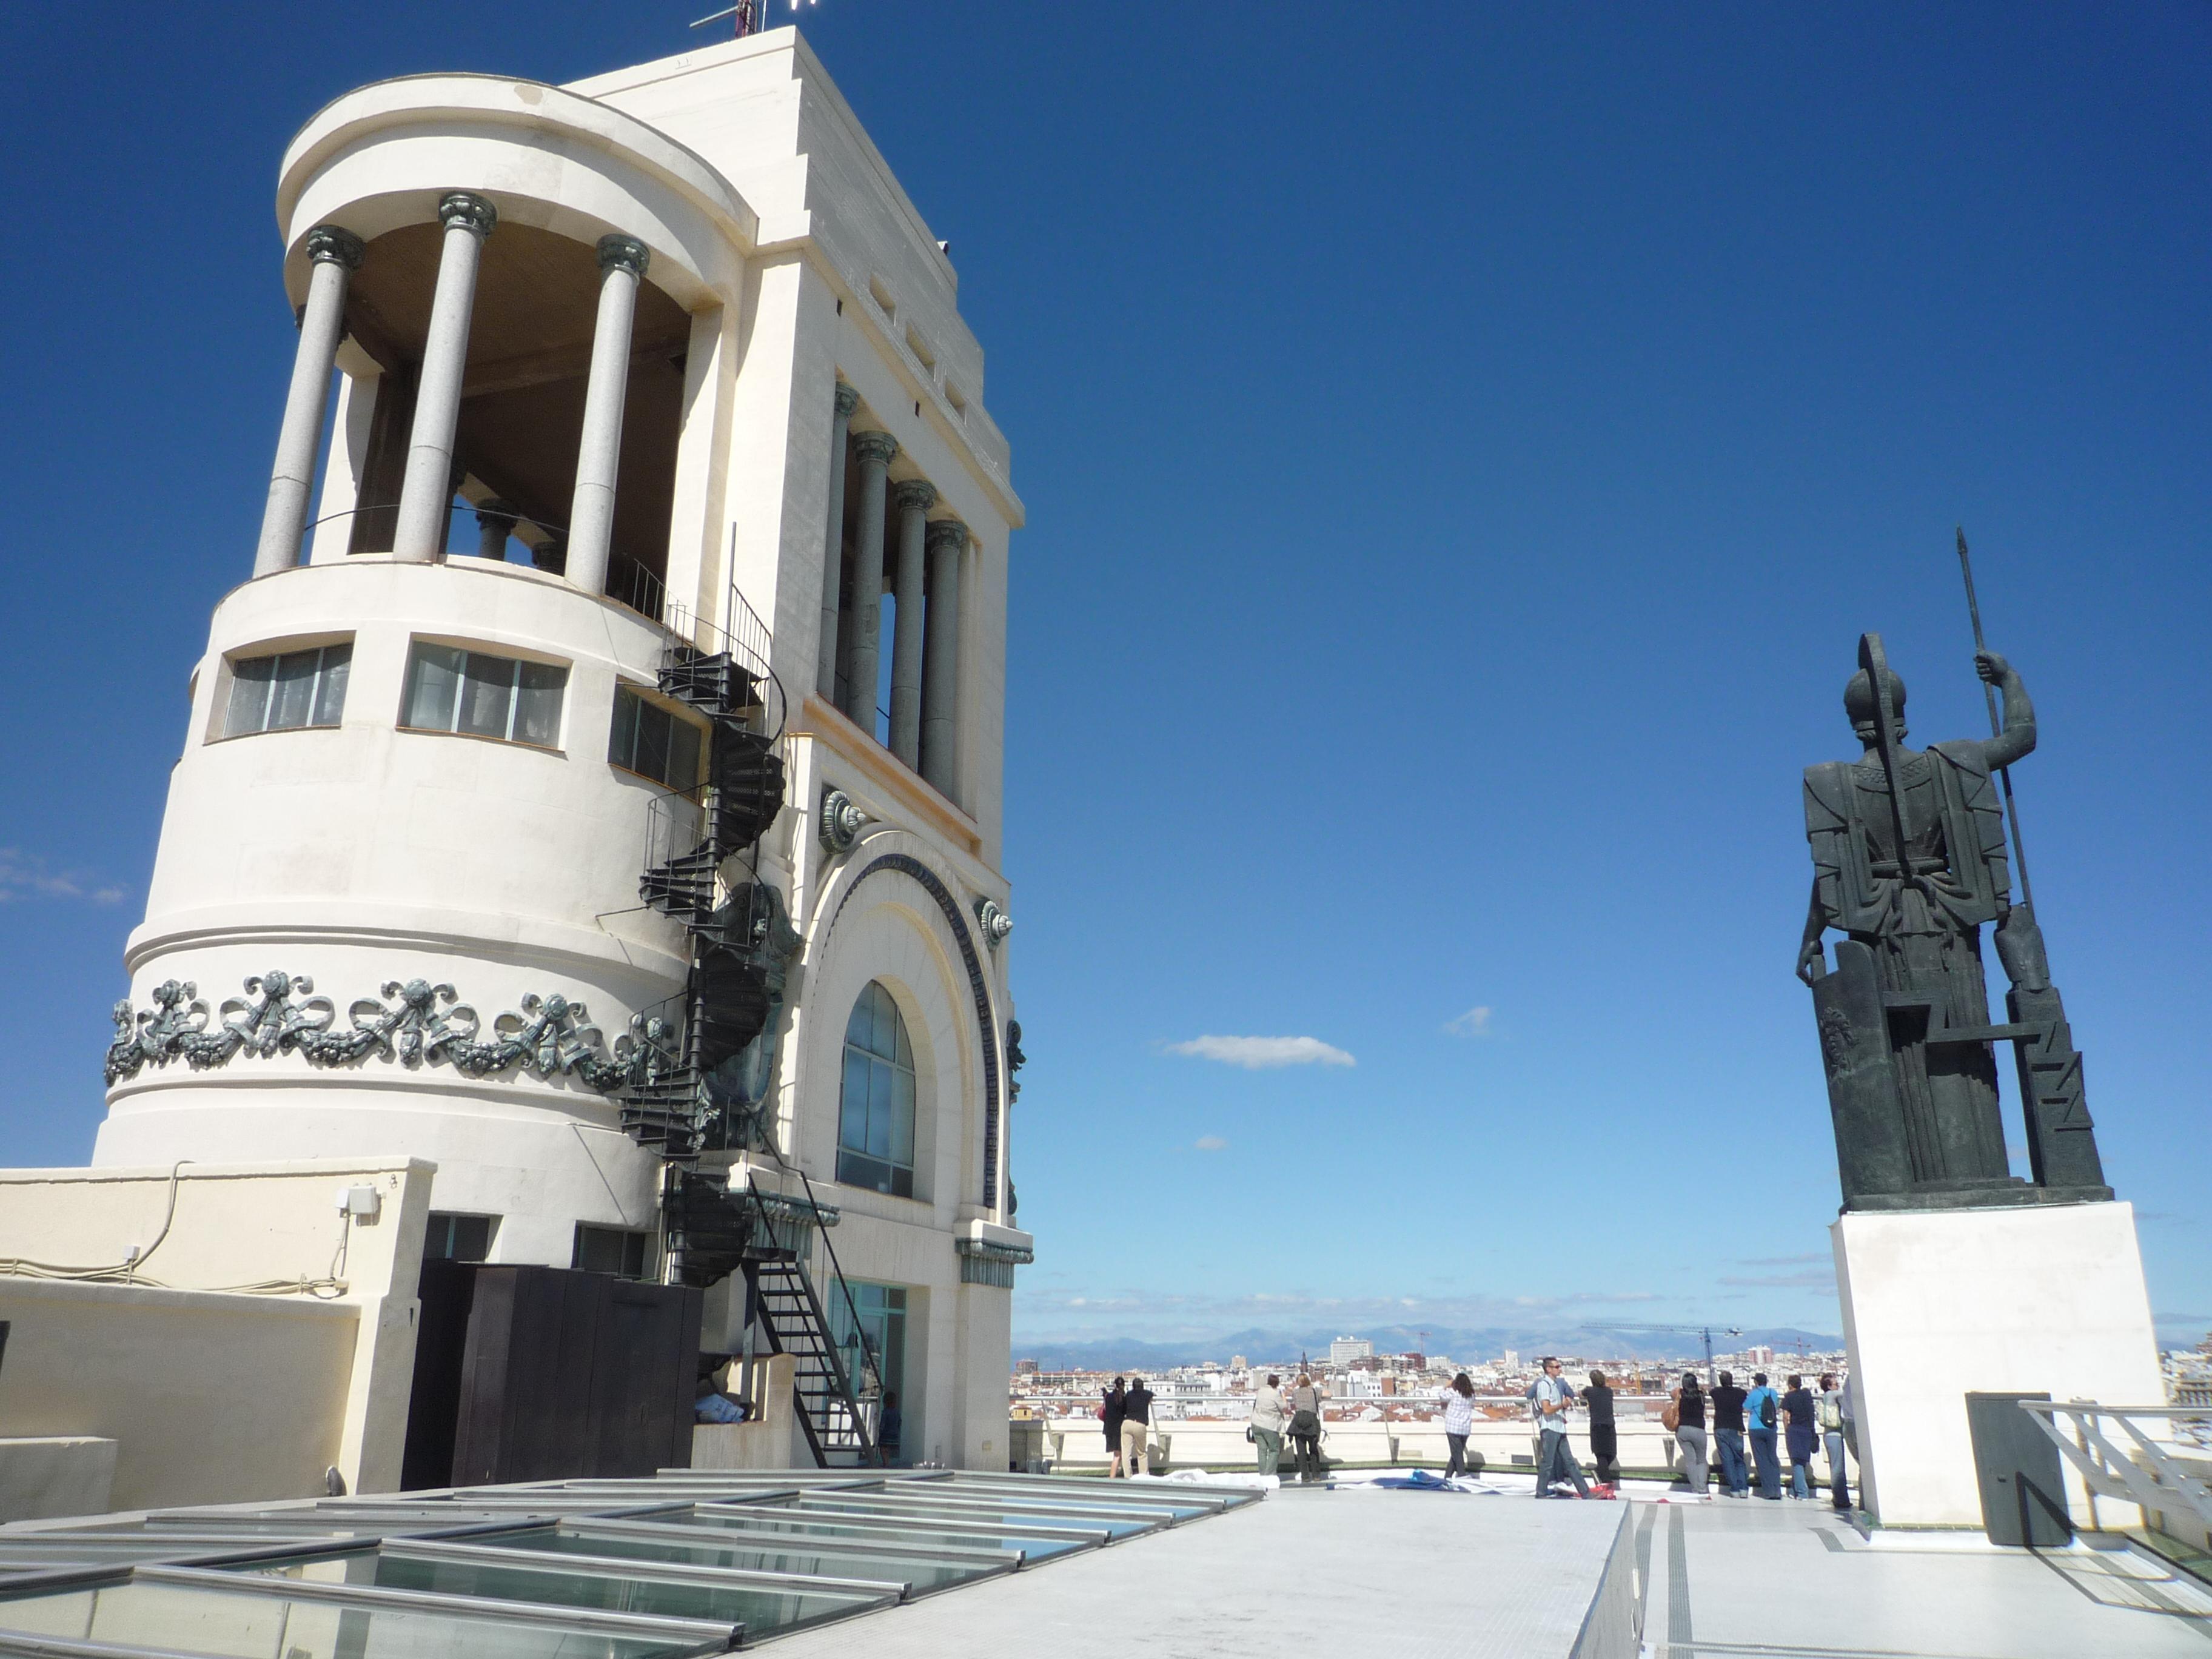 File Circulo De Bellas Artes Azotea Jpg Wikimedia Commons